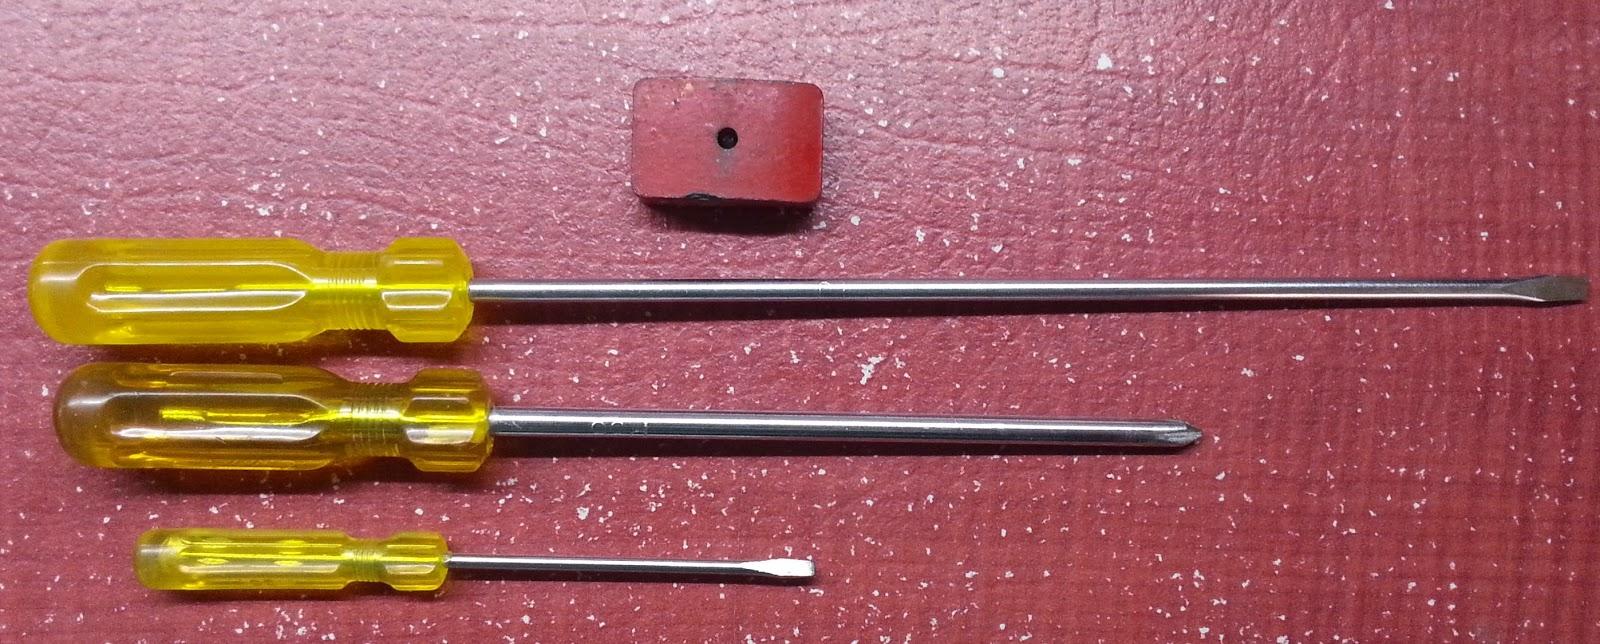 tech freax magnetize a screw driver. Black Bedroom Furniture Sets. Home Design Ideas